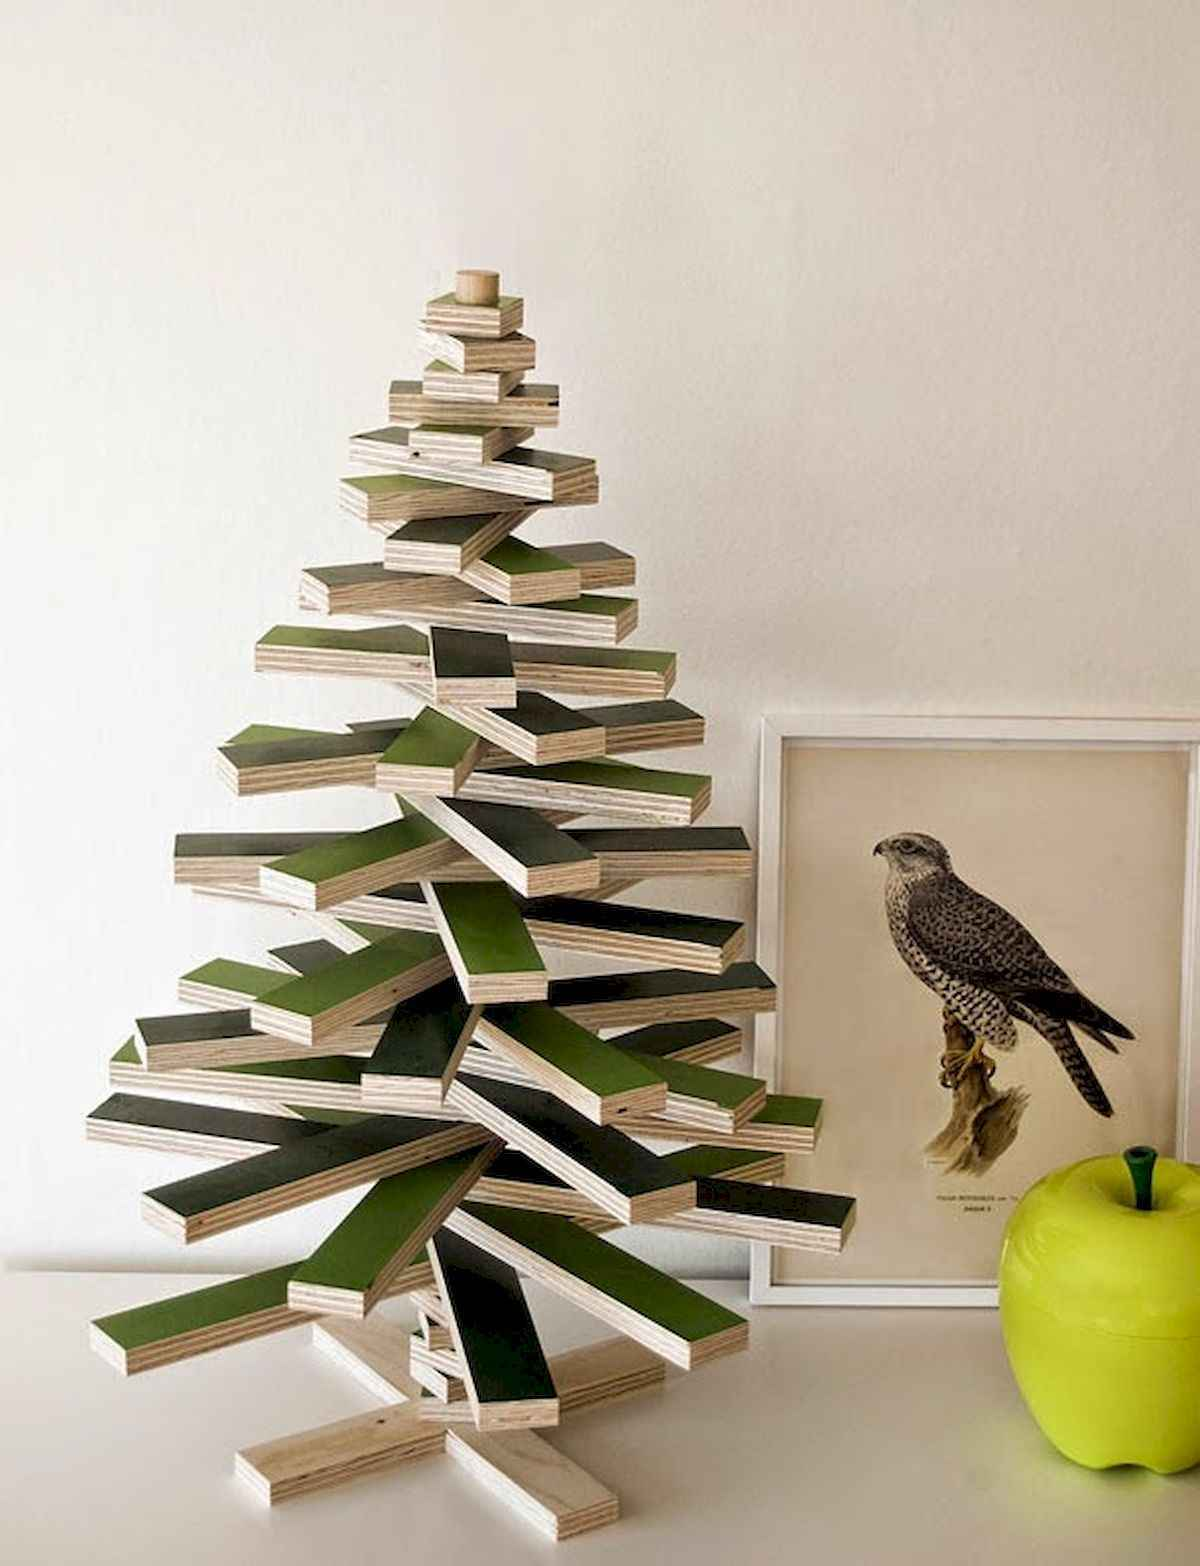 50 diy christmas decorations ideas (27)